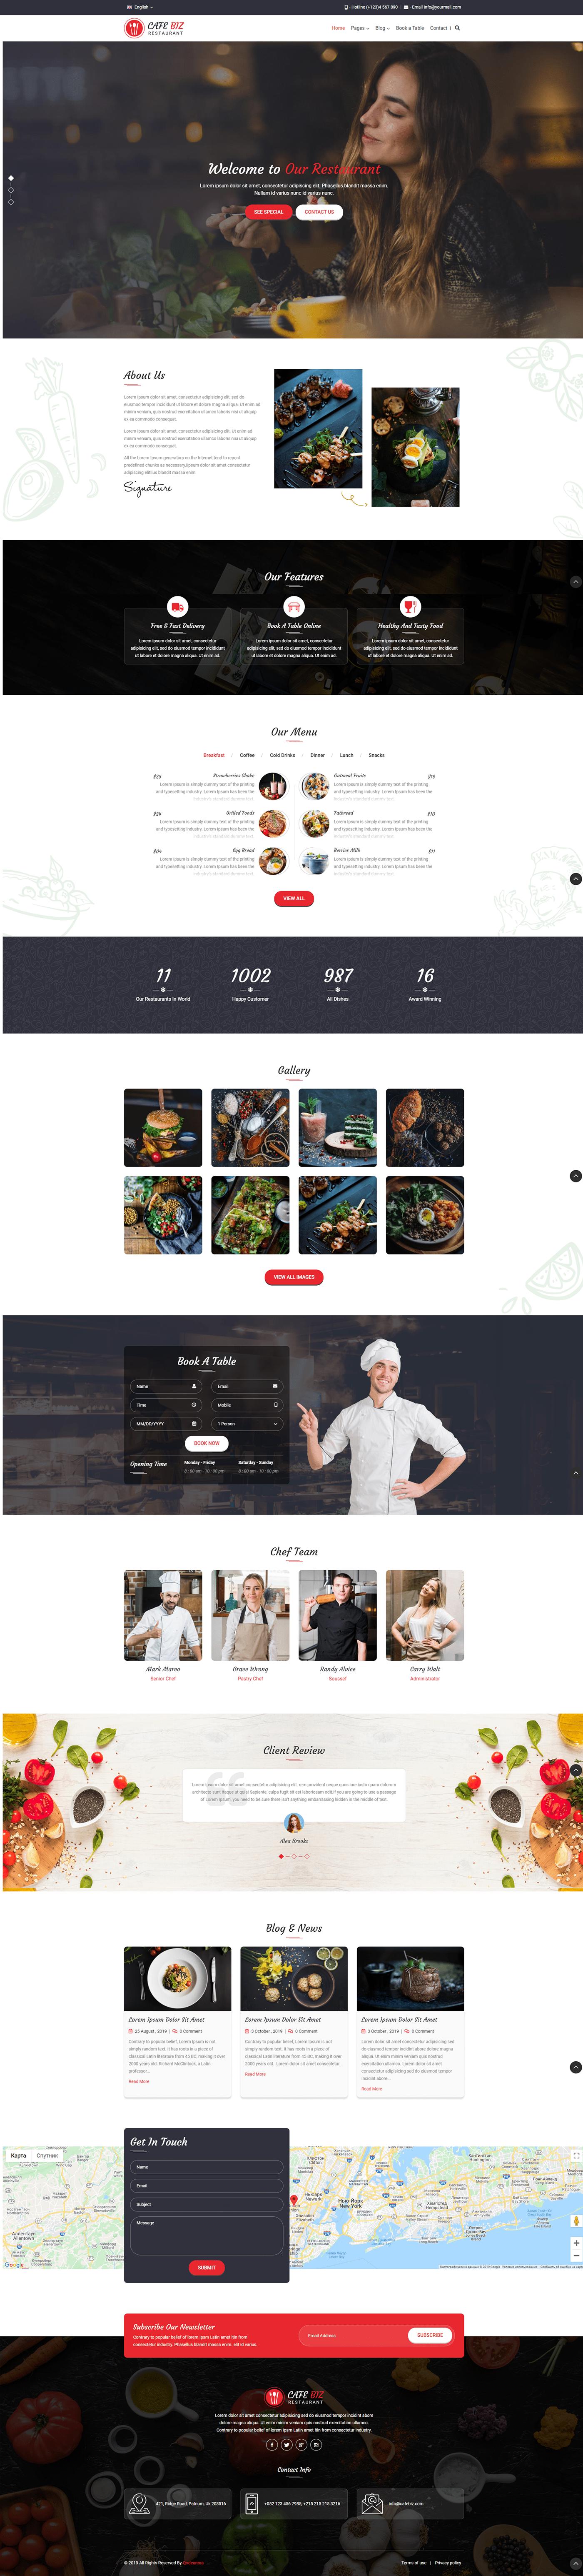 wordpress Theme restaurant Food  bar clean backery pagebuilder cooking